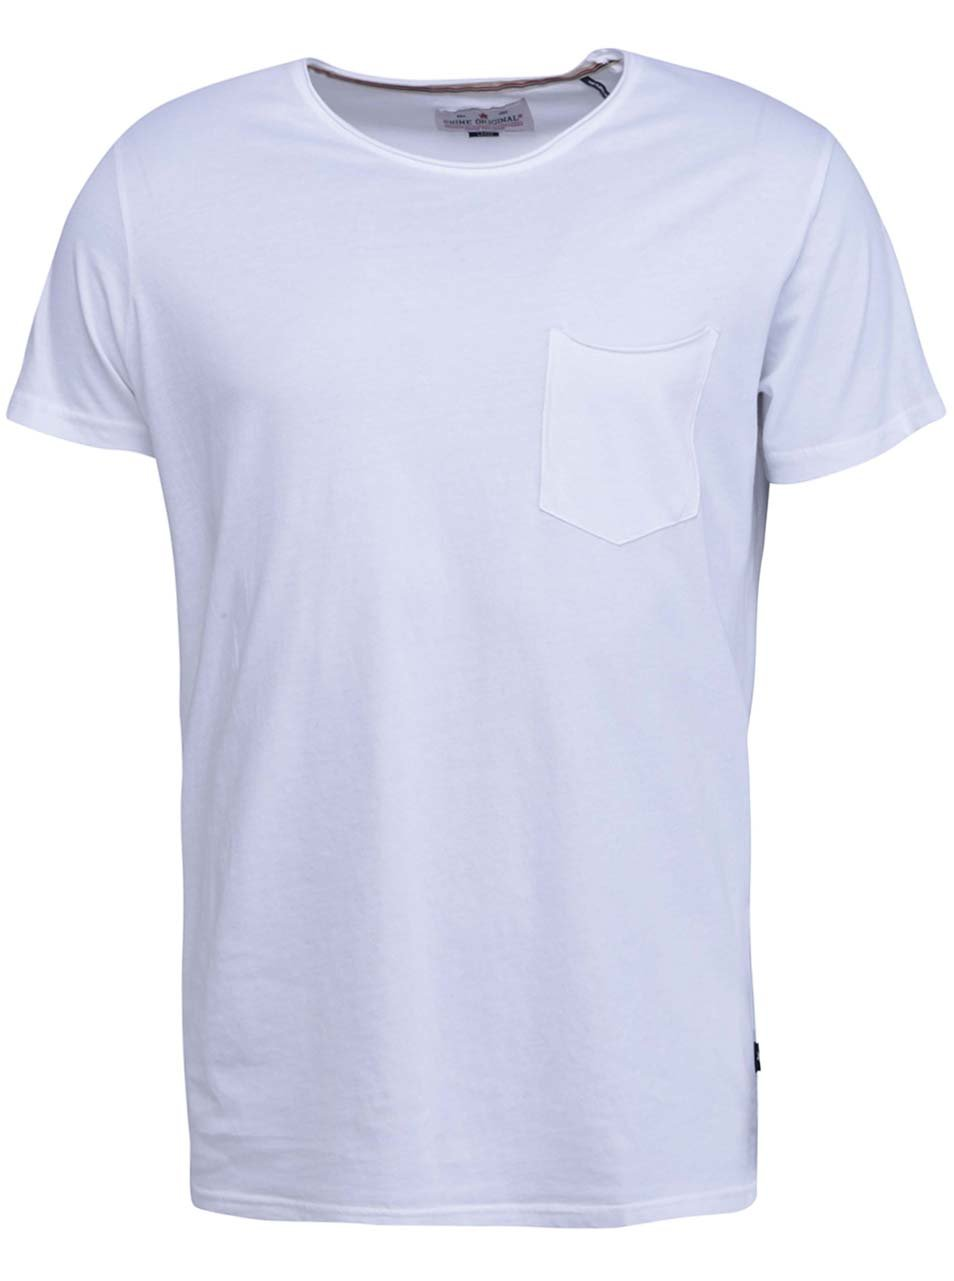 408d6518afc7 Biele tričko s krátkym rukávom Shine Original Andy